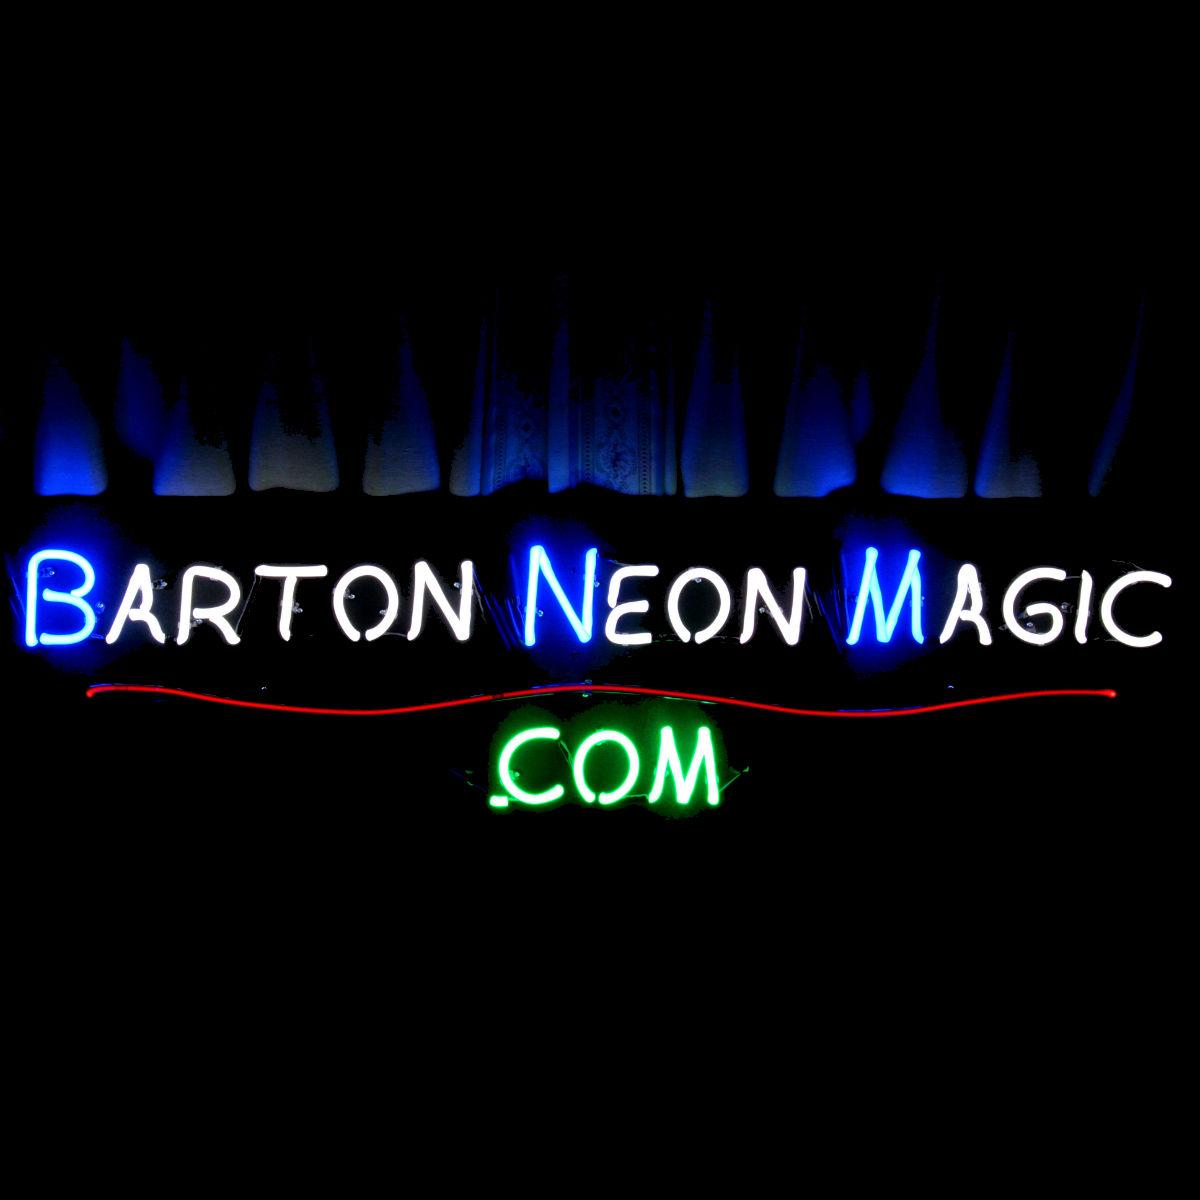 Studebaker & Packard Dealership Neon Signs by John Barton - former New Studebaker Packard Car Dealer - BartonNeonMagic.com